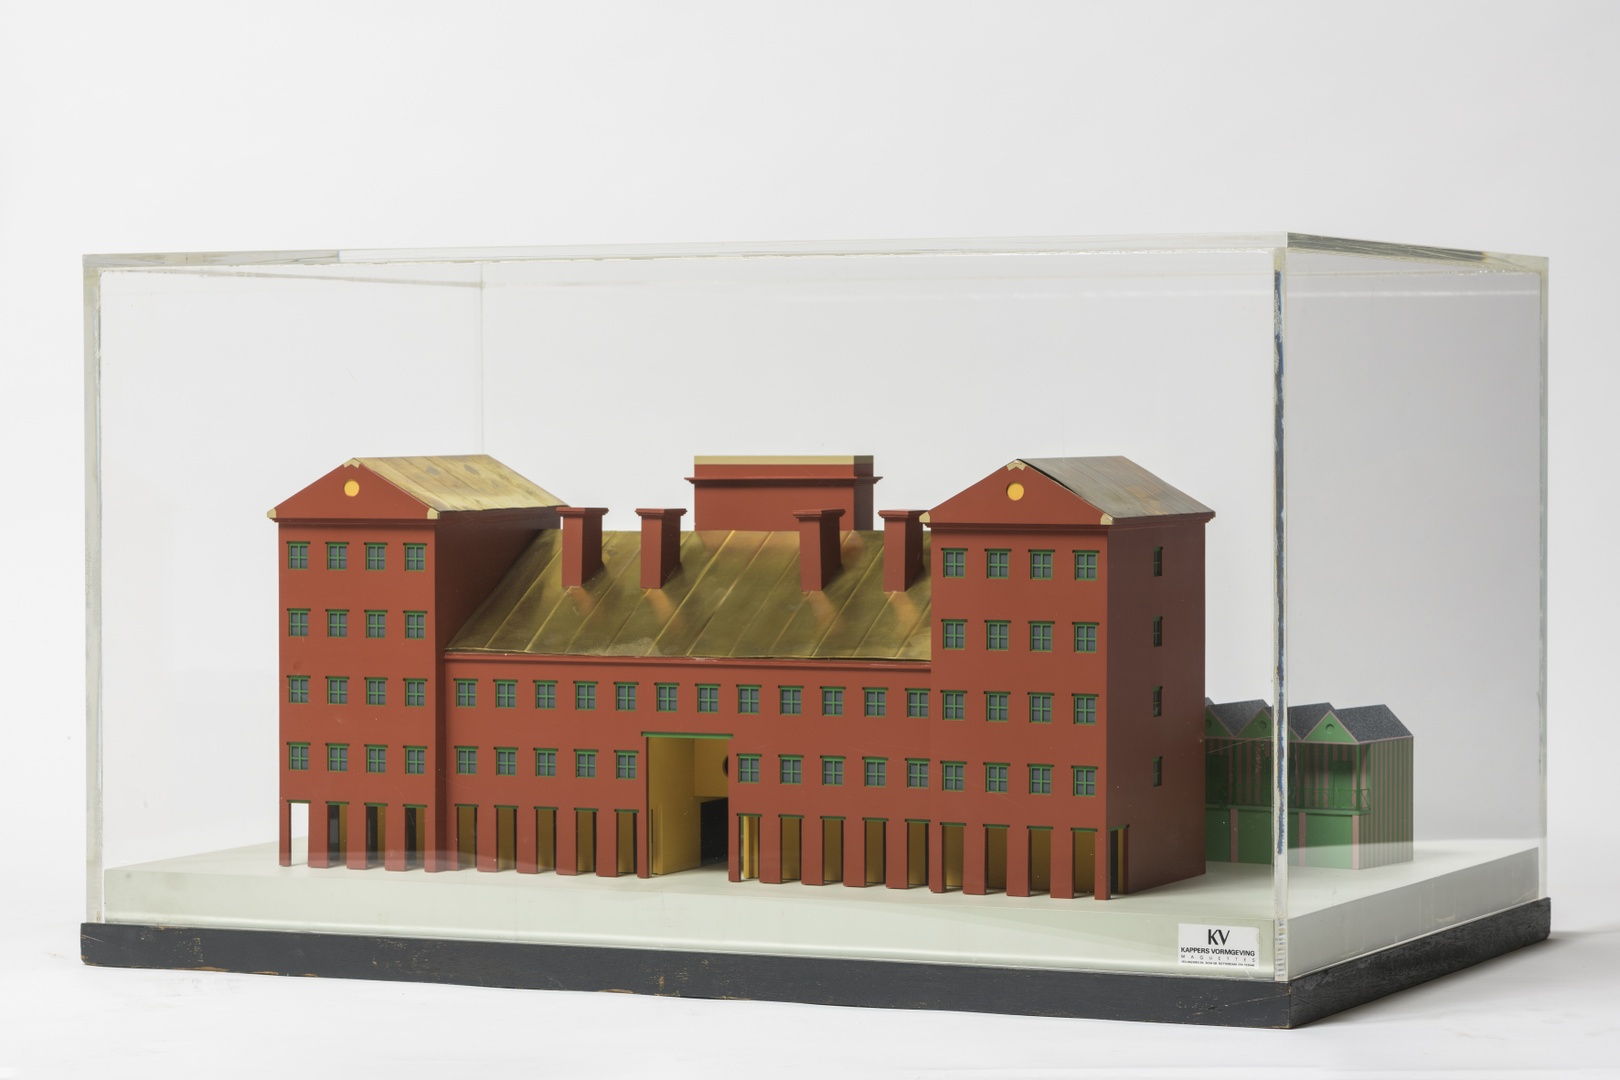 Maquette woonblok in Viadana